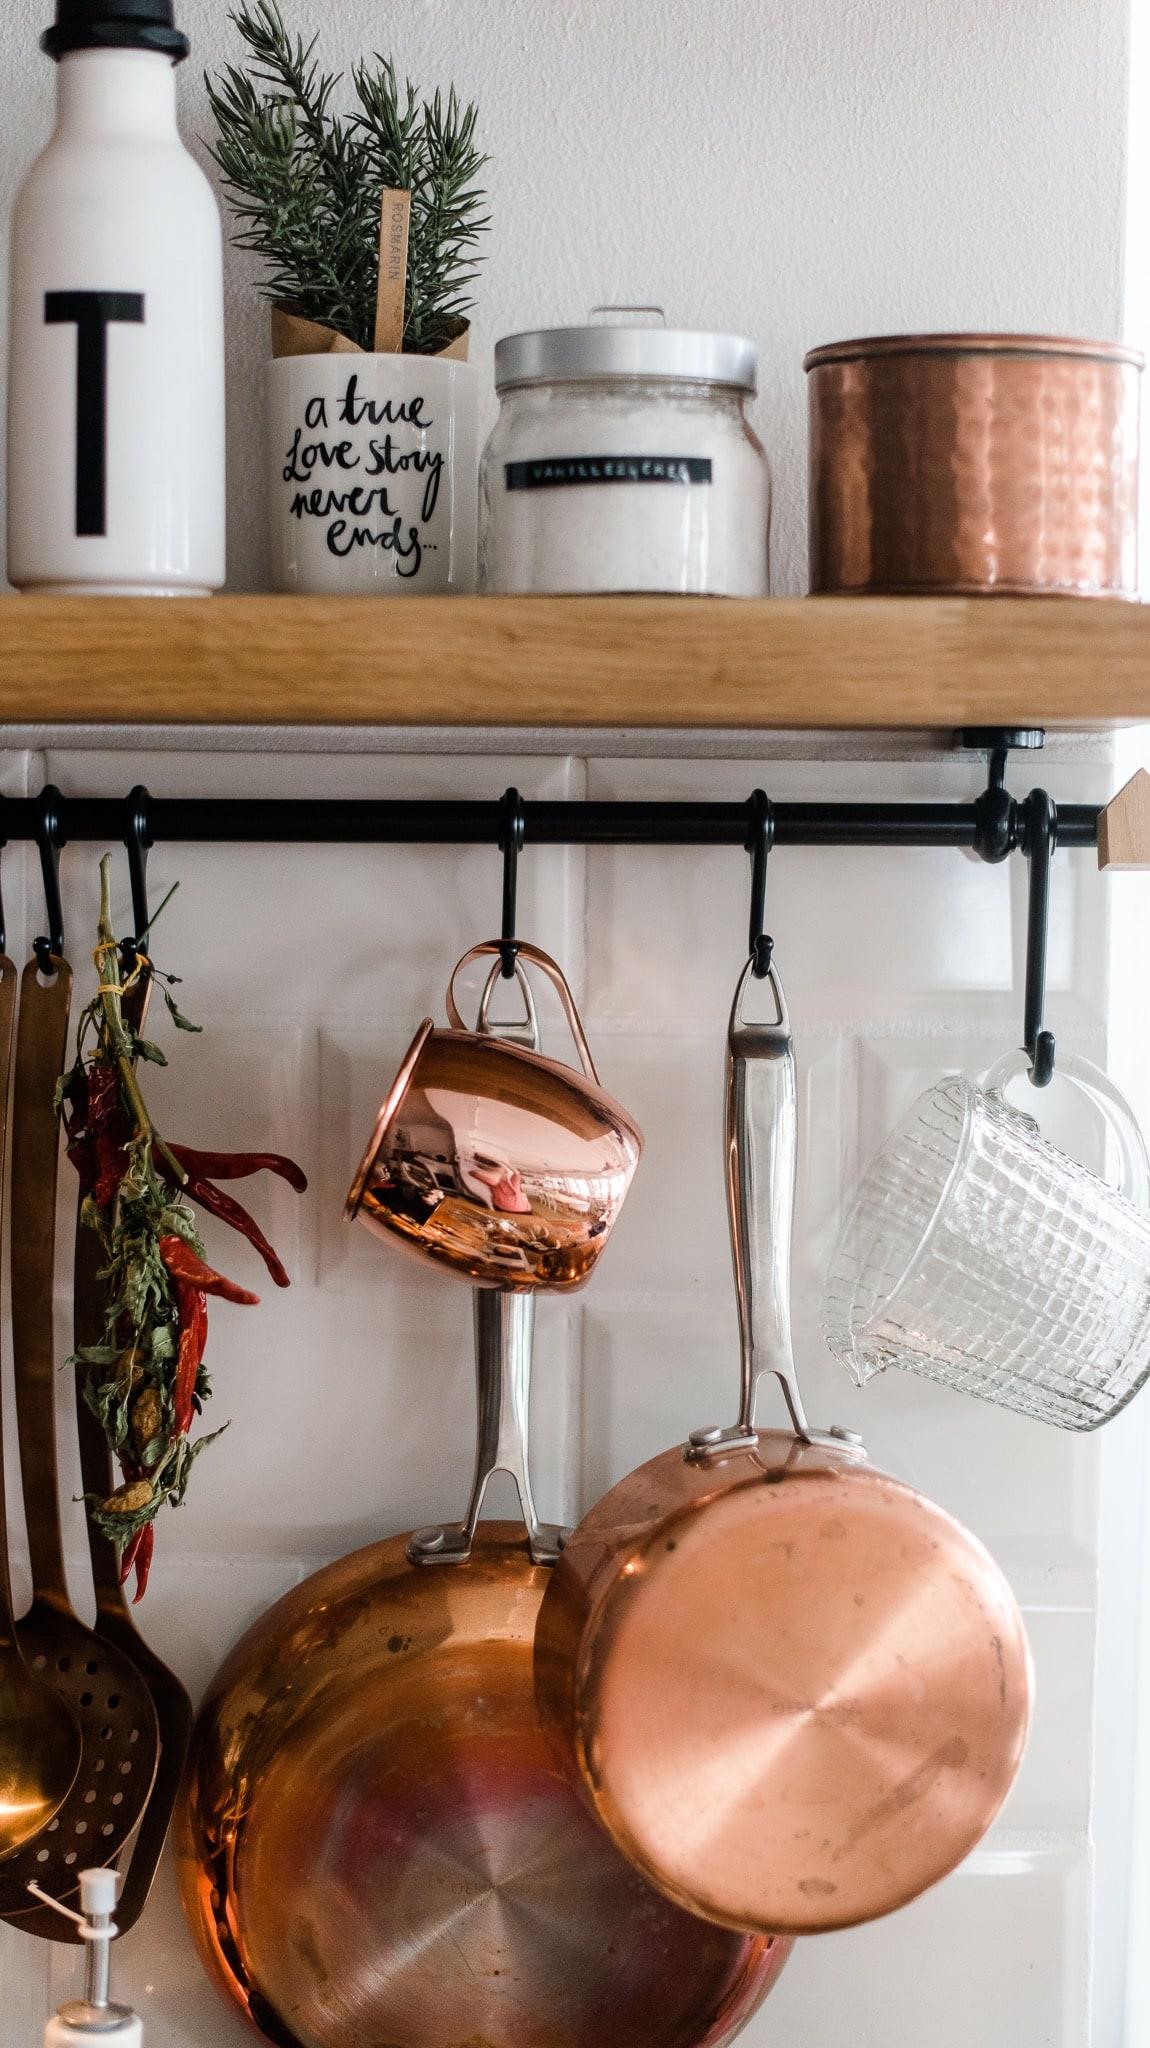 Küche seelensachen Detail